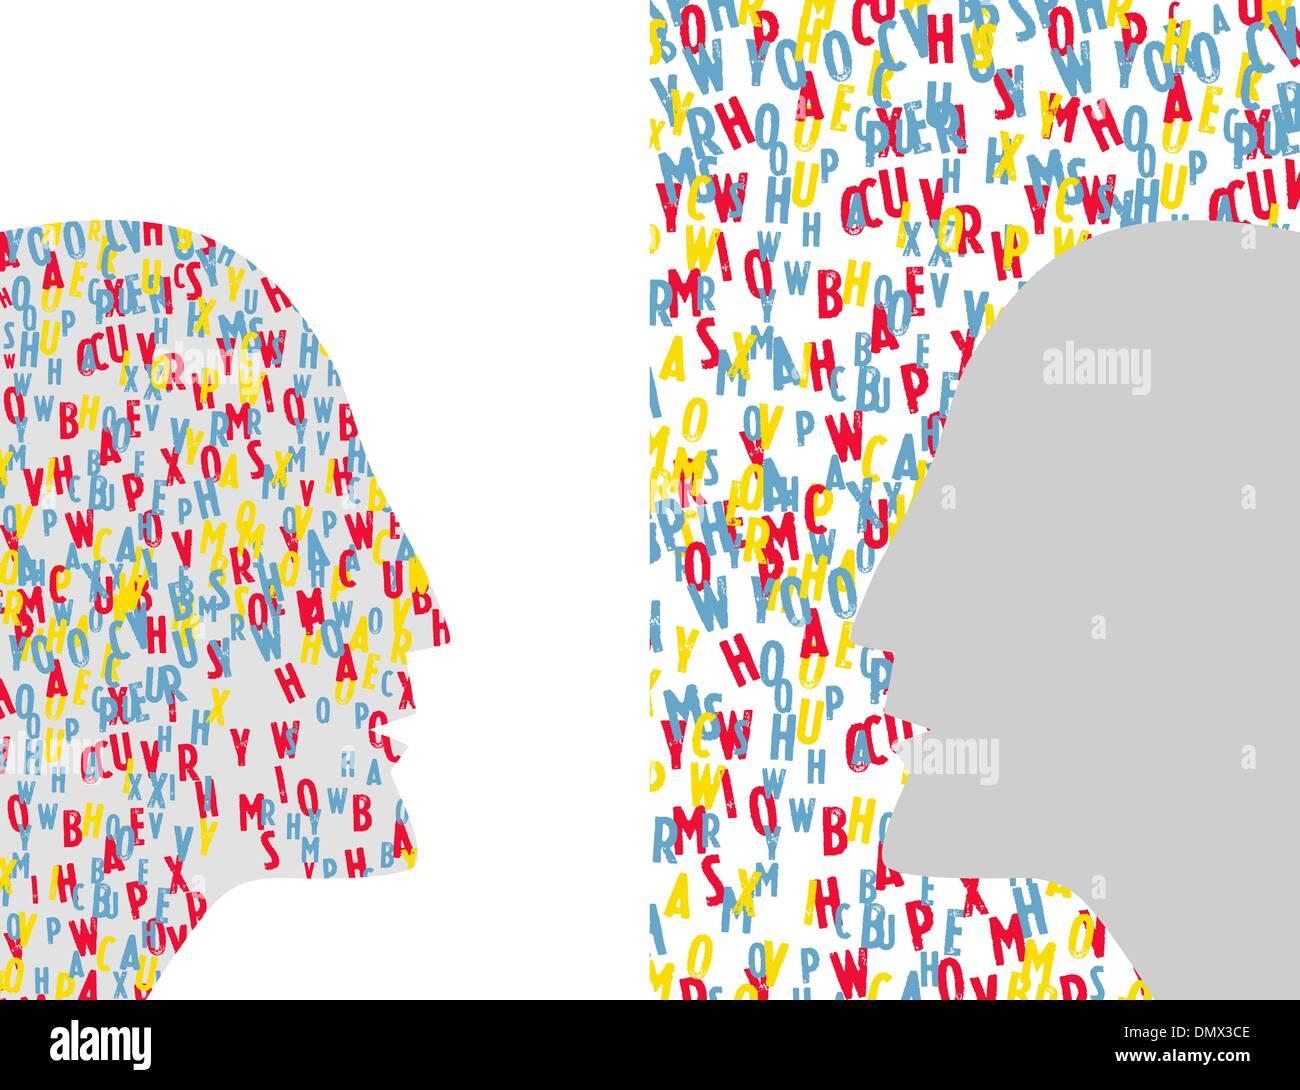 Vector People Talking - Dialogue Stock Vector